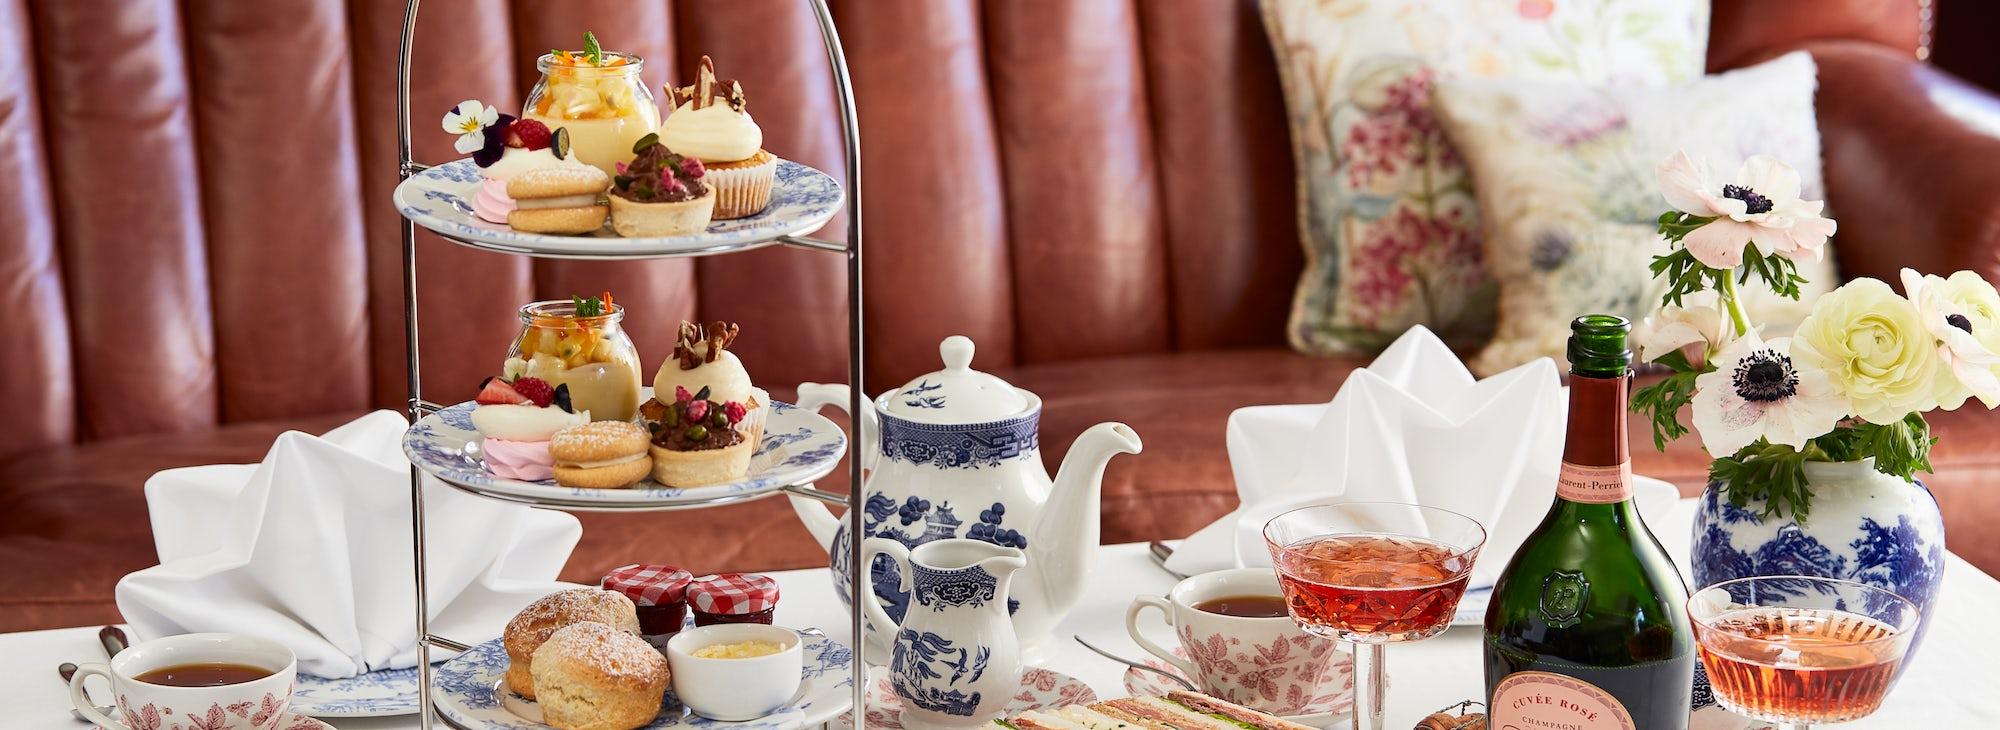 Afternoon Tea at Drumossie